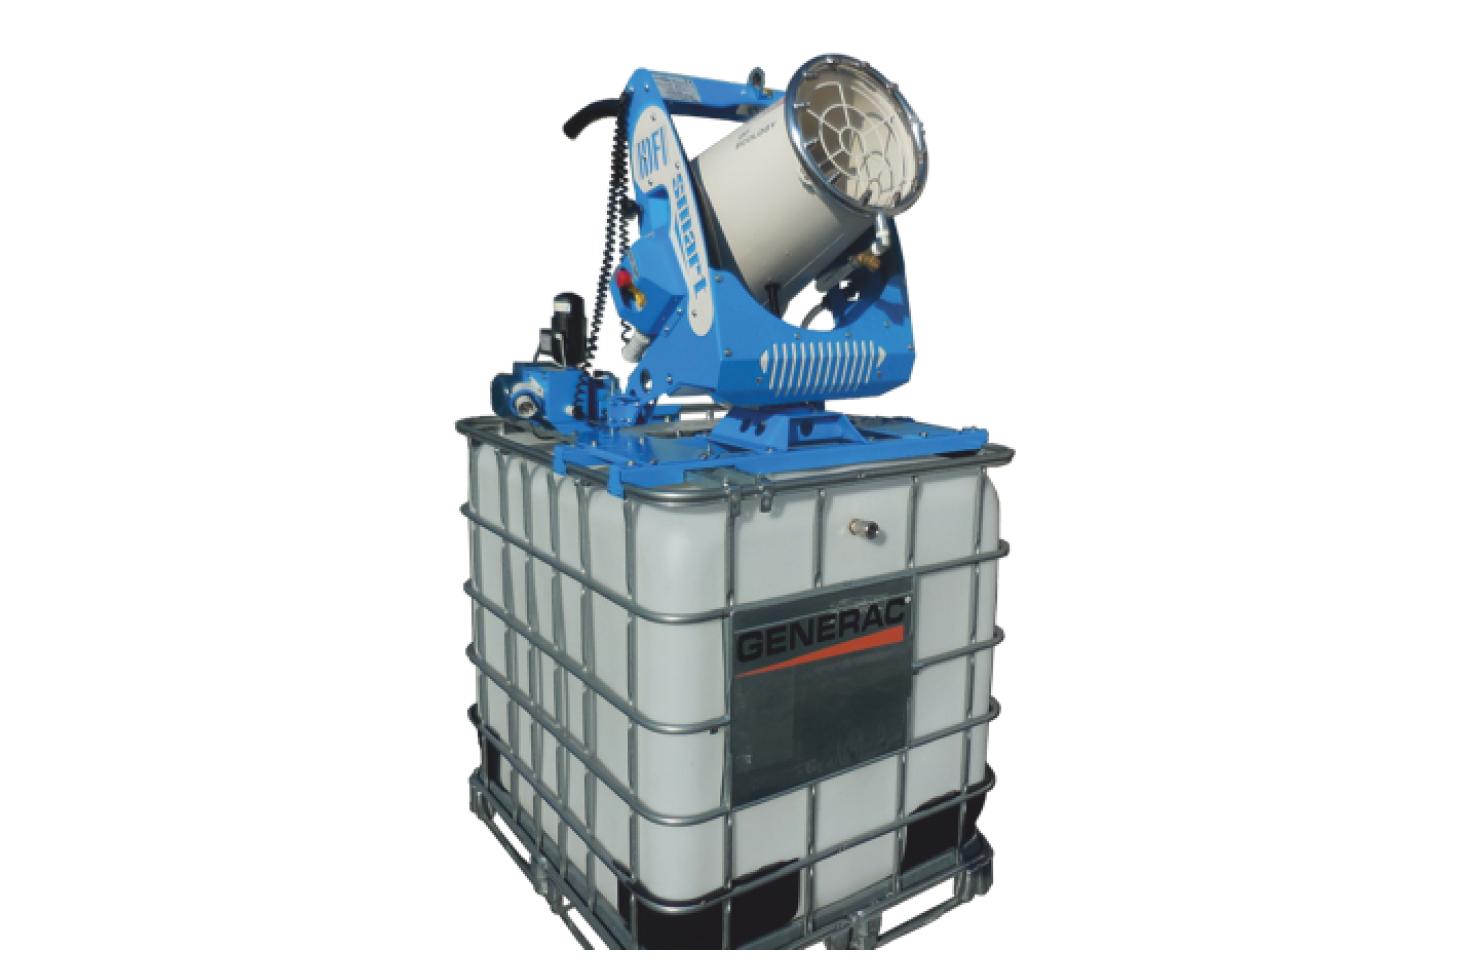 DF Smart All In One Generac Mobile Установка подавления пыли